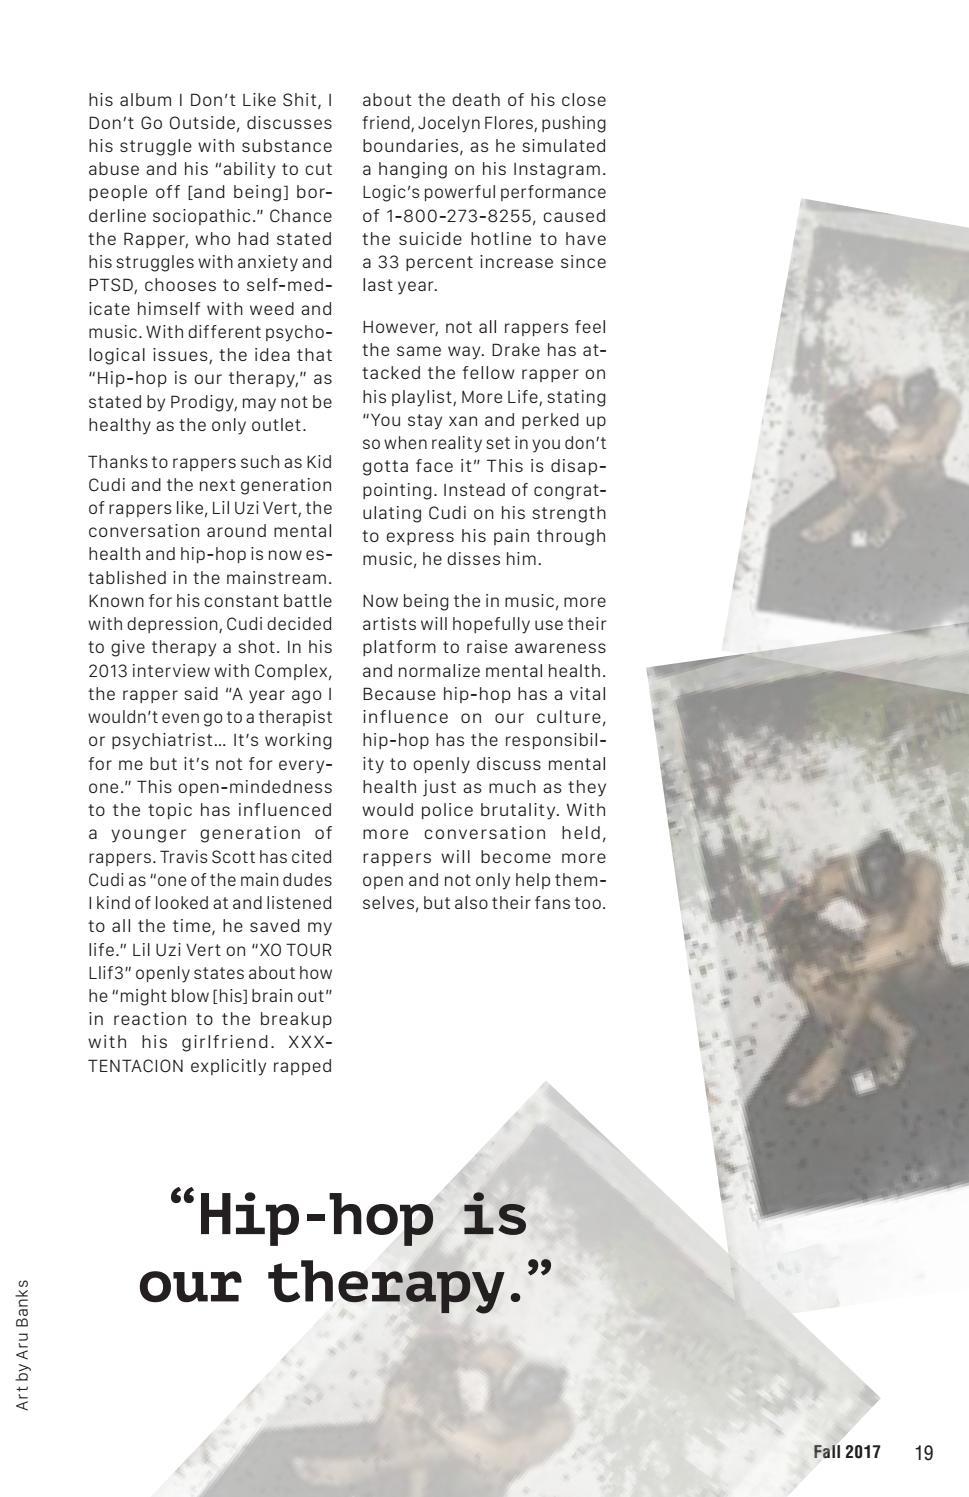 Mixtape Magazine Fall 17 by dk feeley - issuu